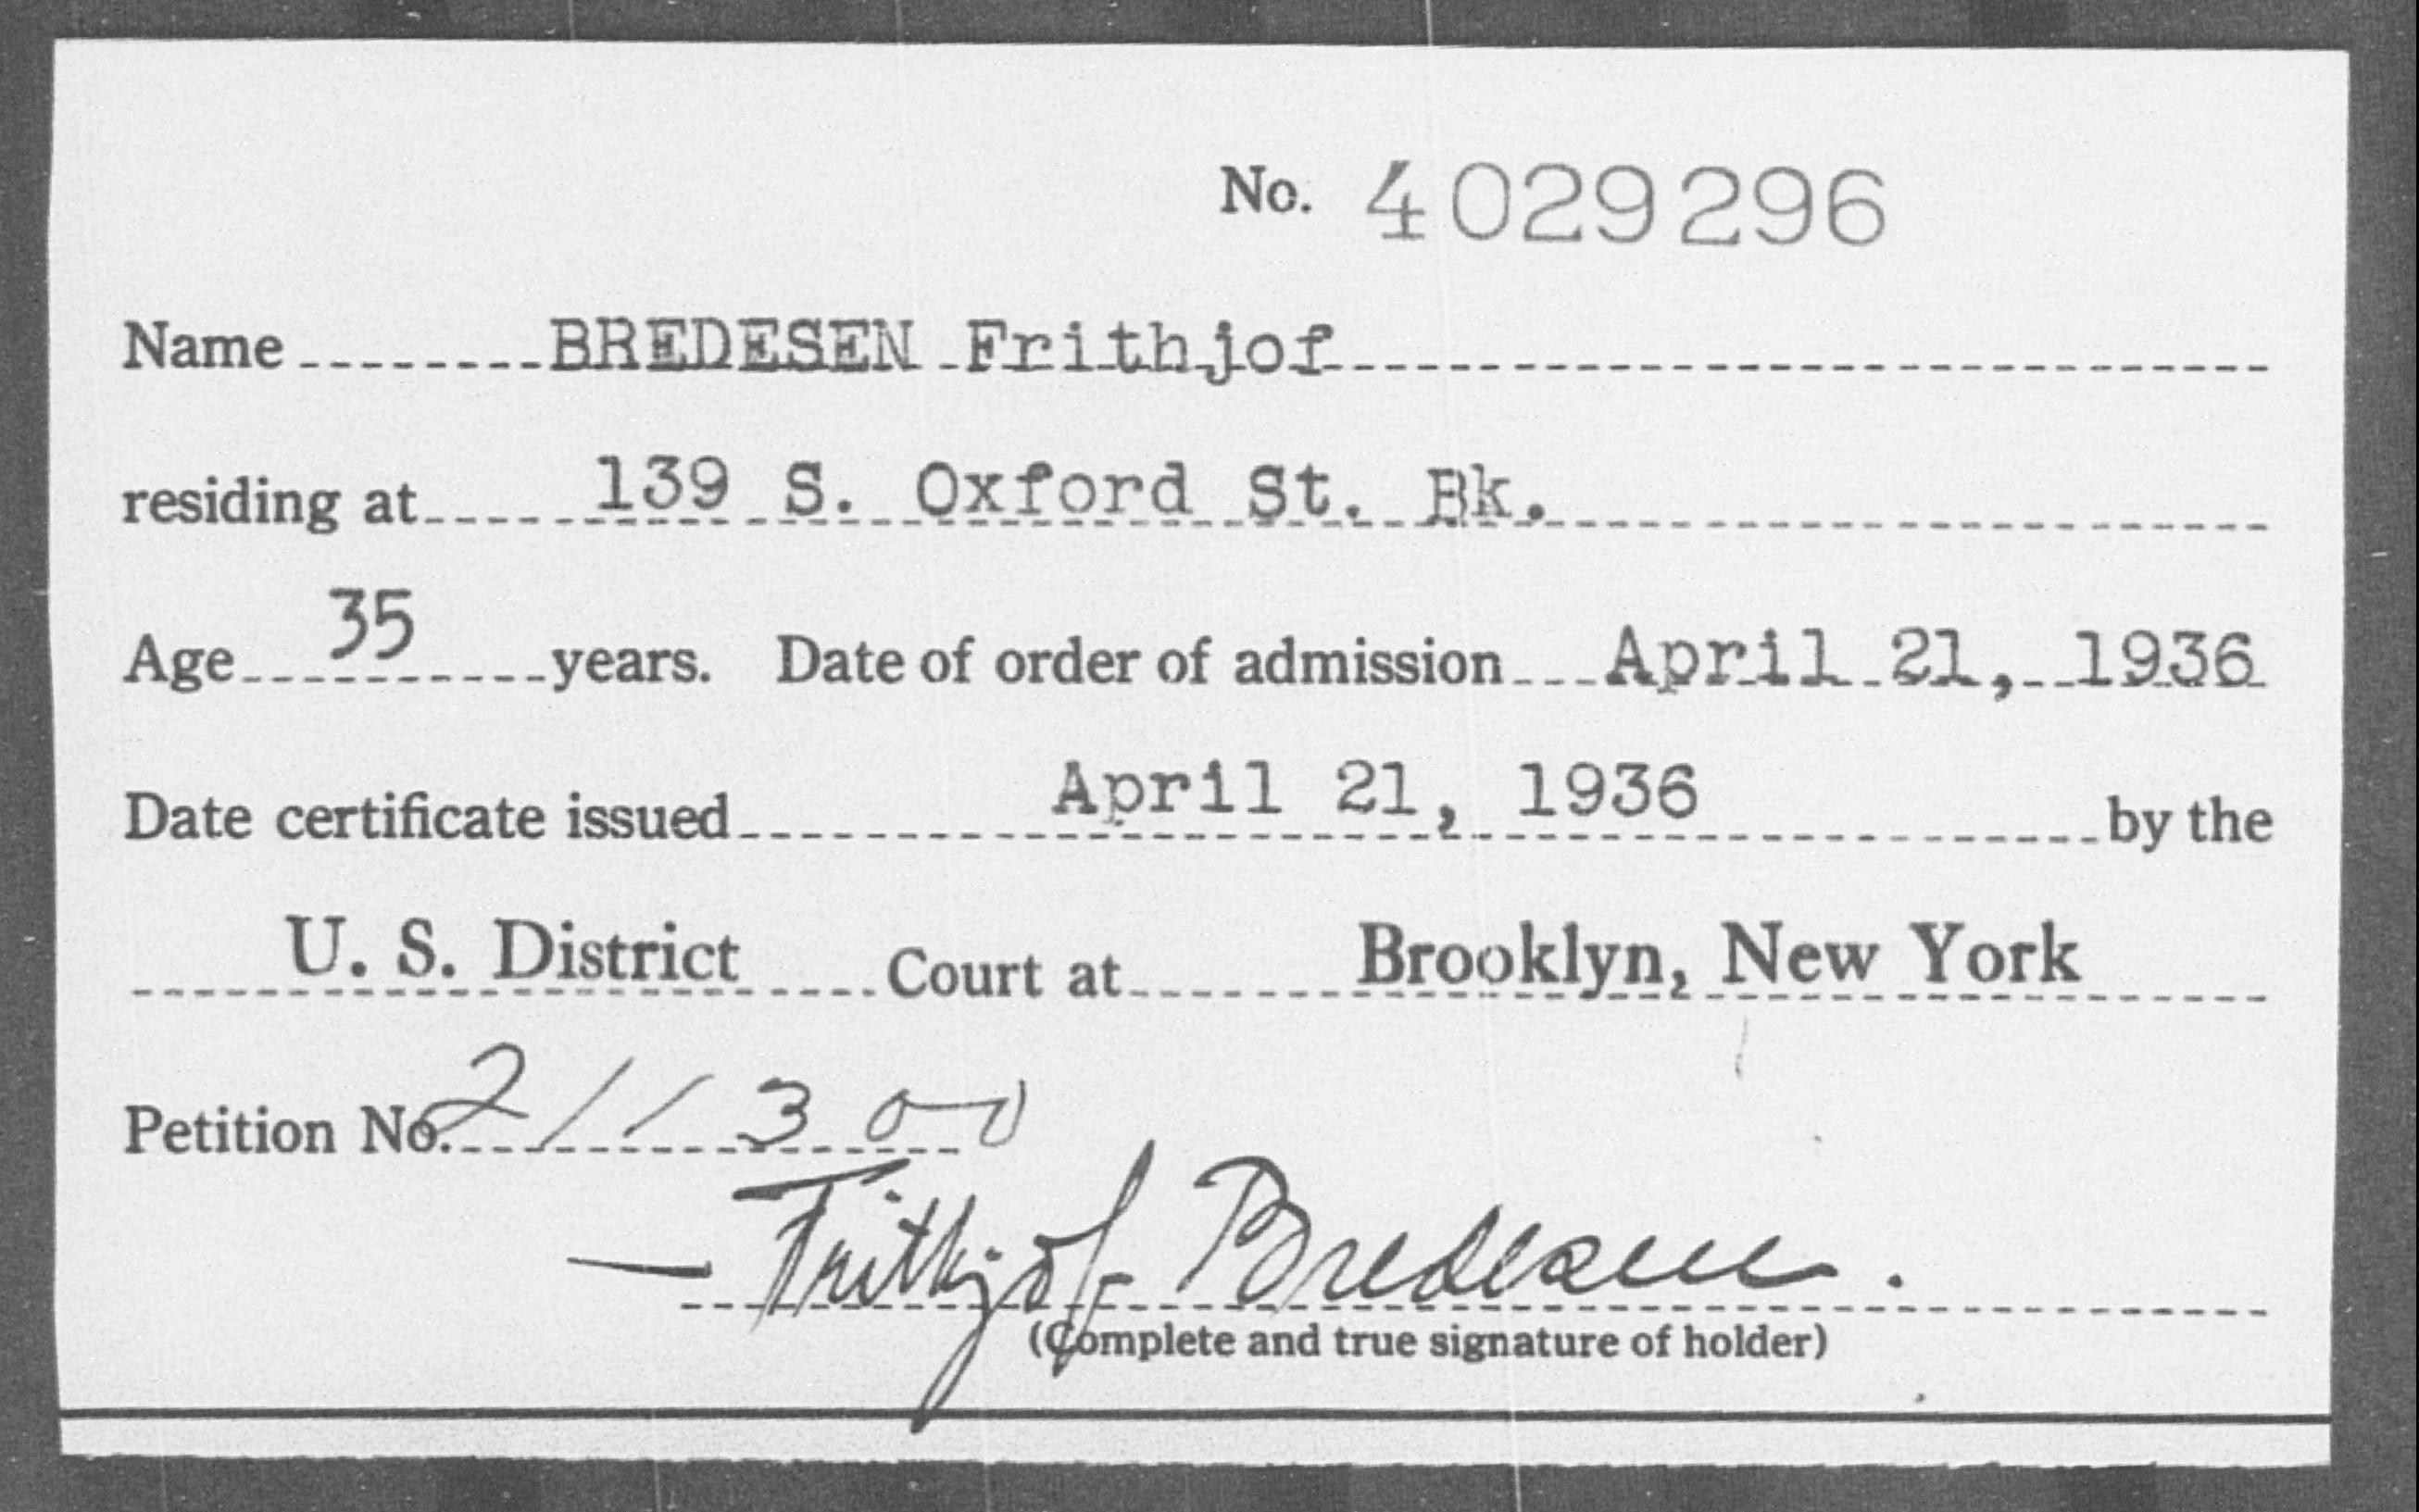 BREDESEN Frithjof - Born: [BLANK], Naturalized: 1936